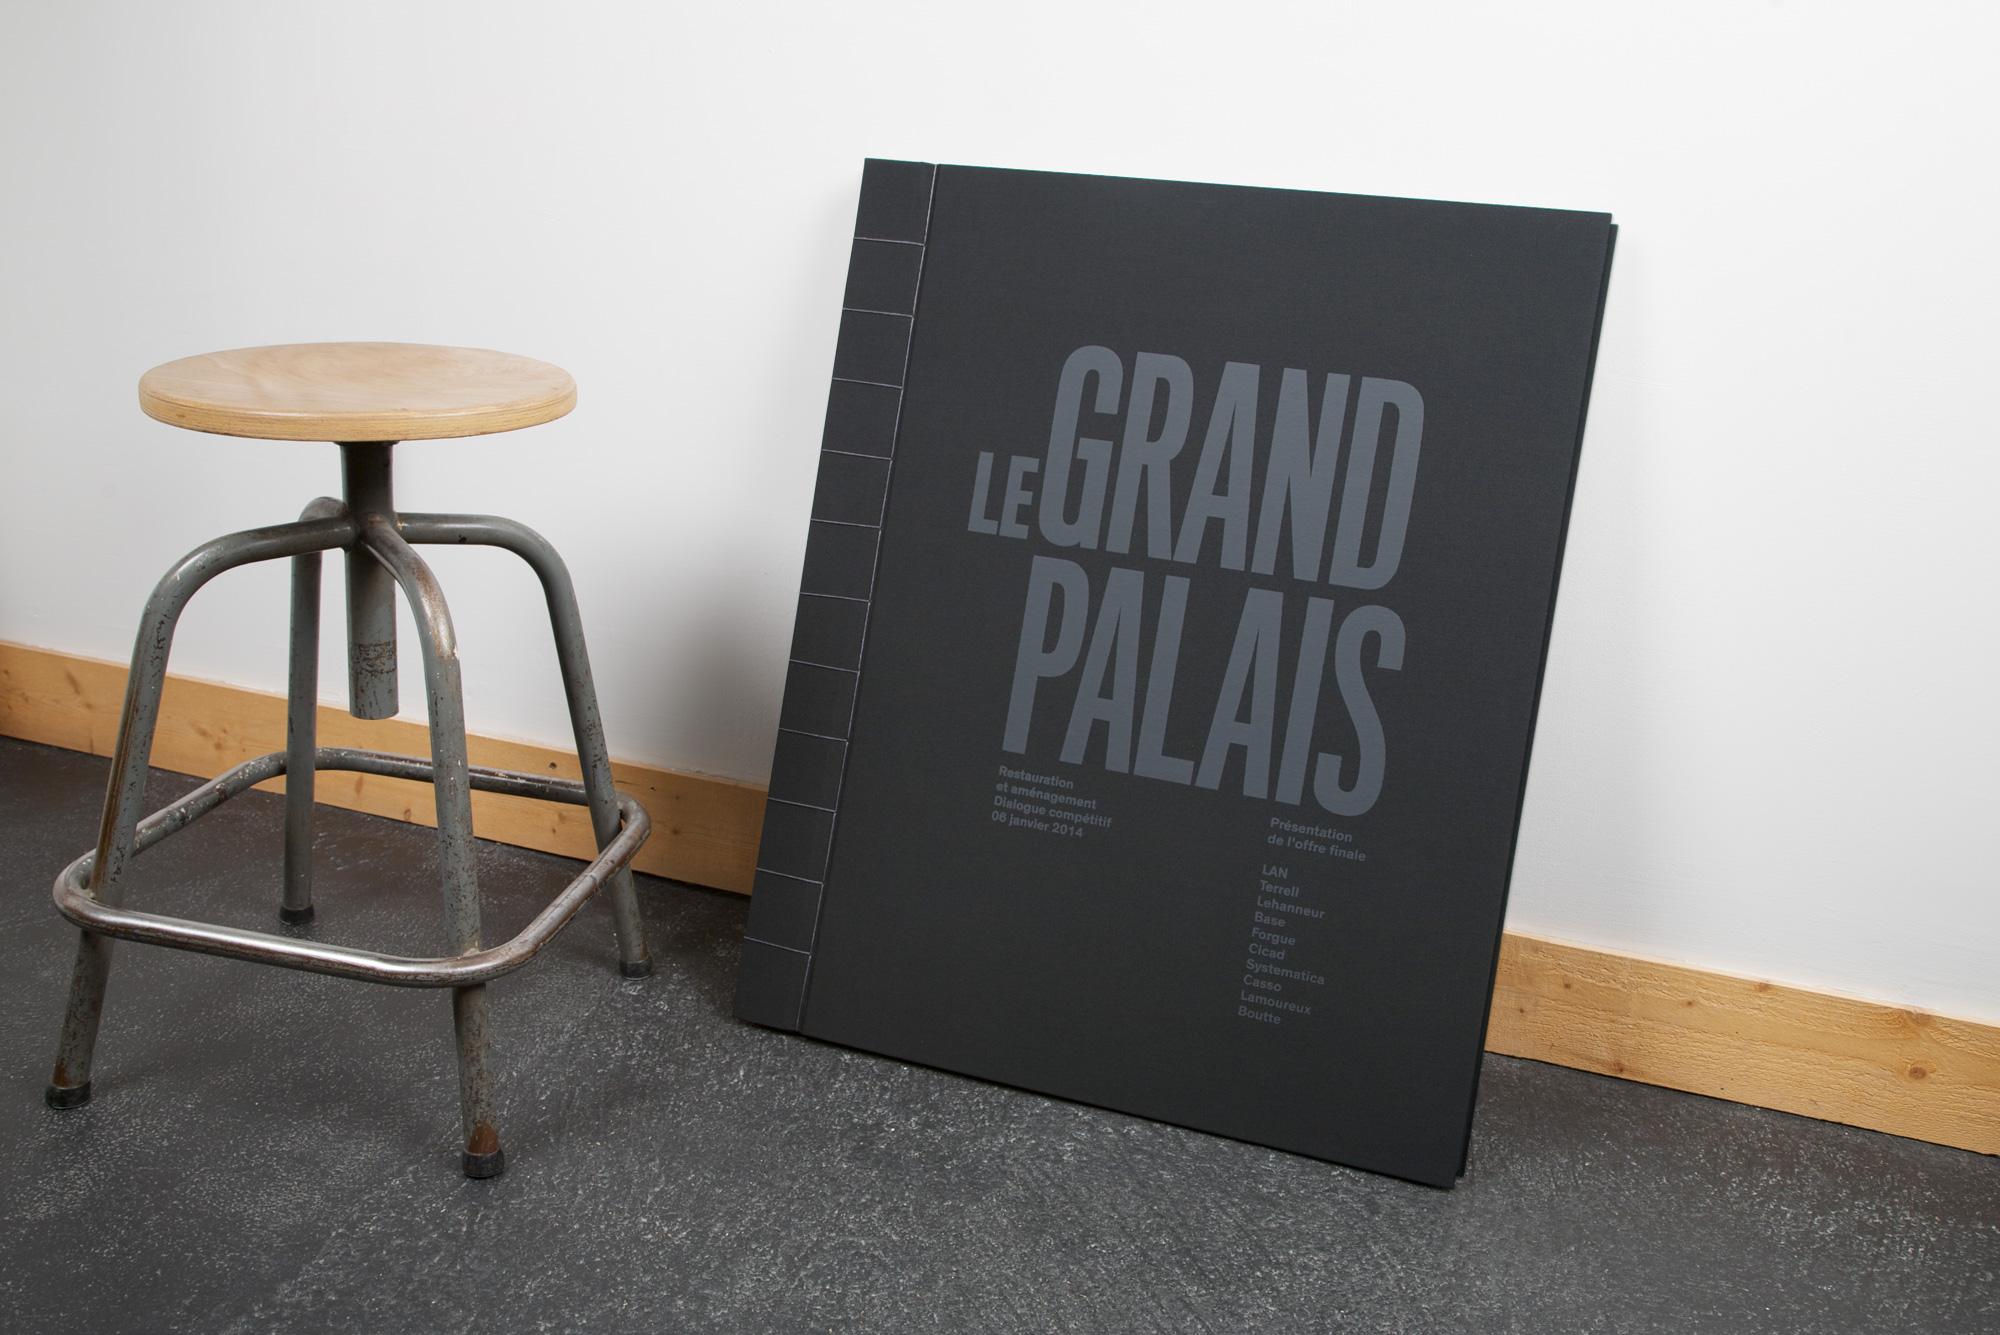 Lan u2013 le grand palais · gallery · font bureau